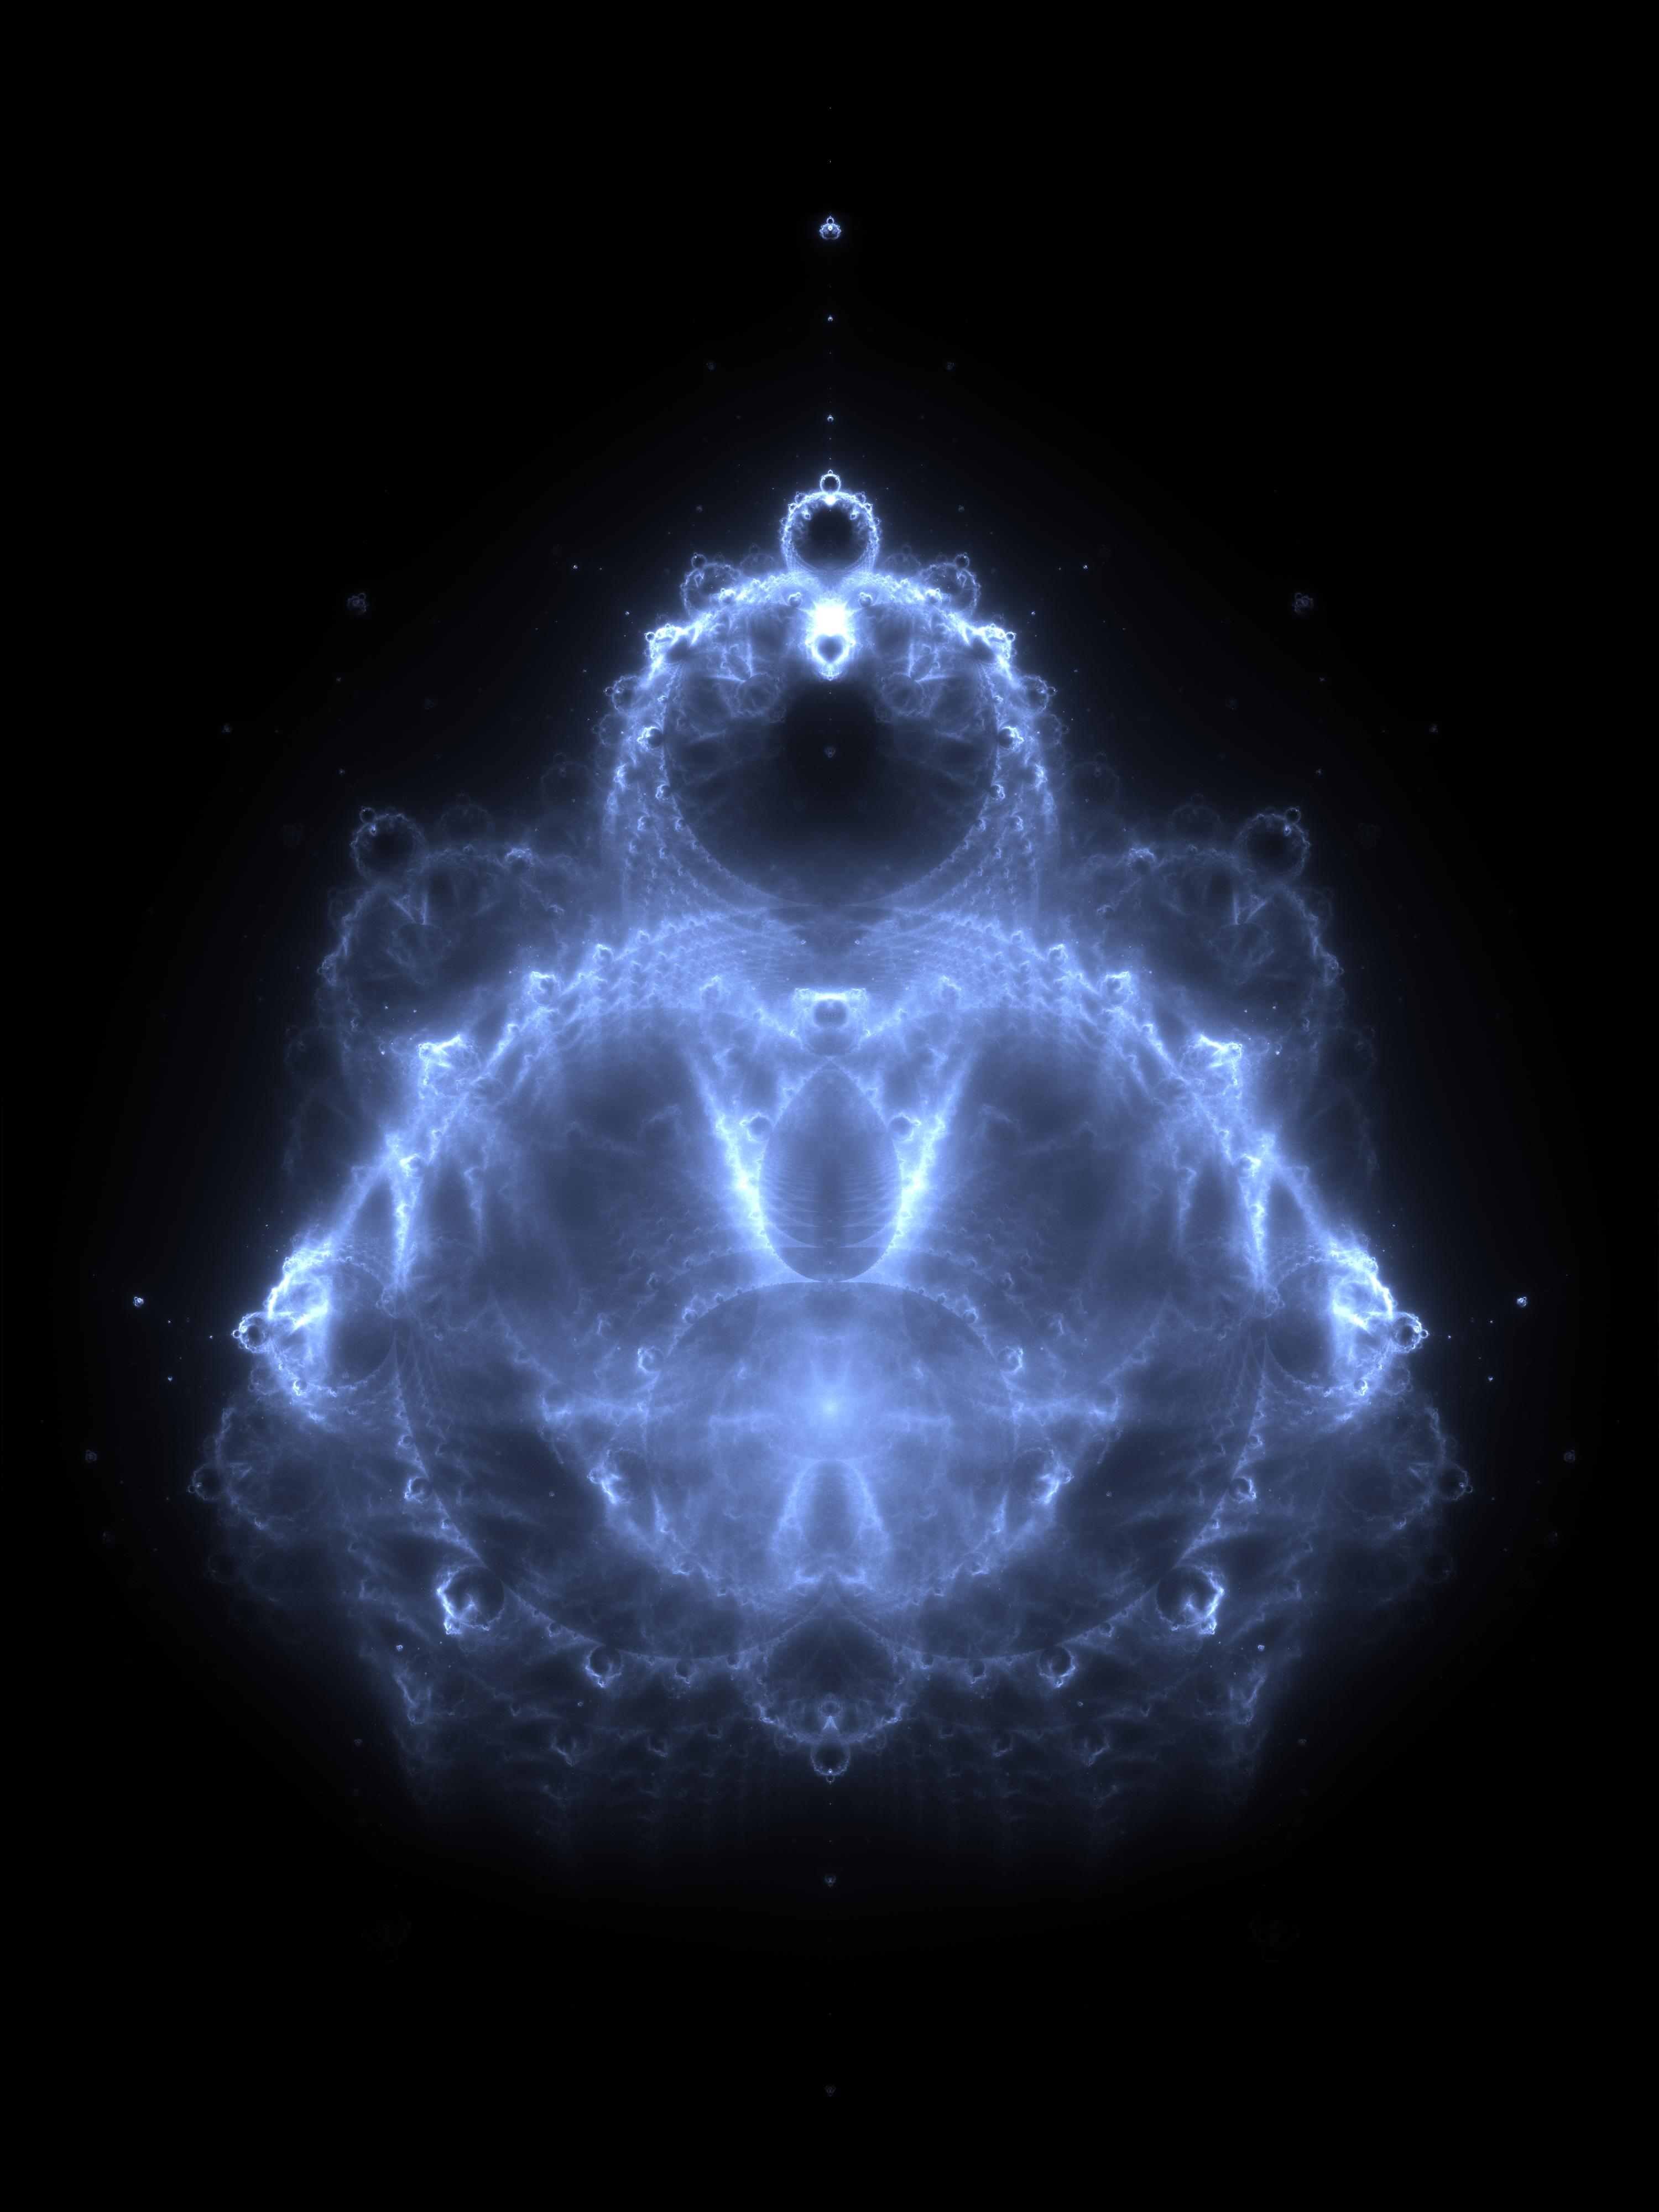 buddhabrot image